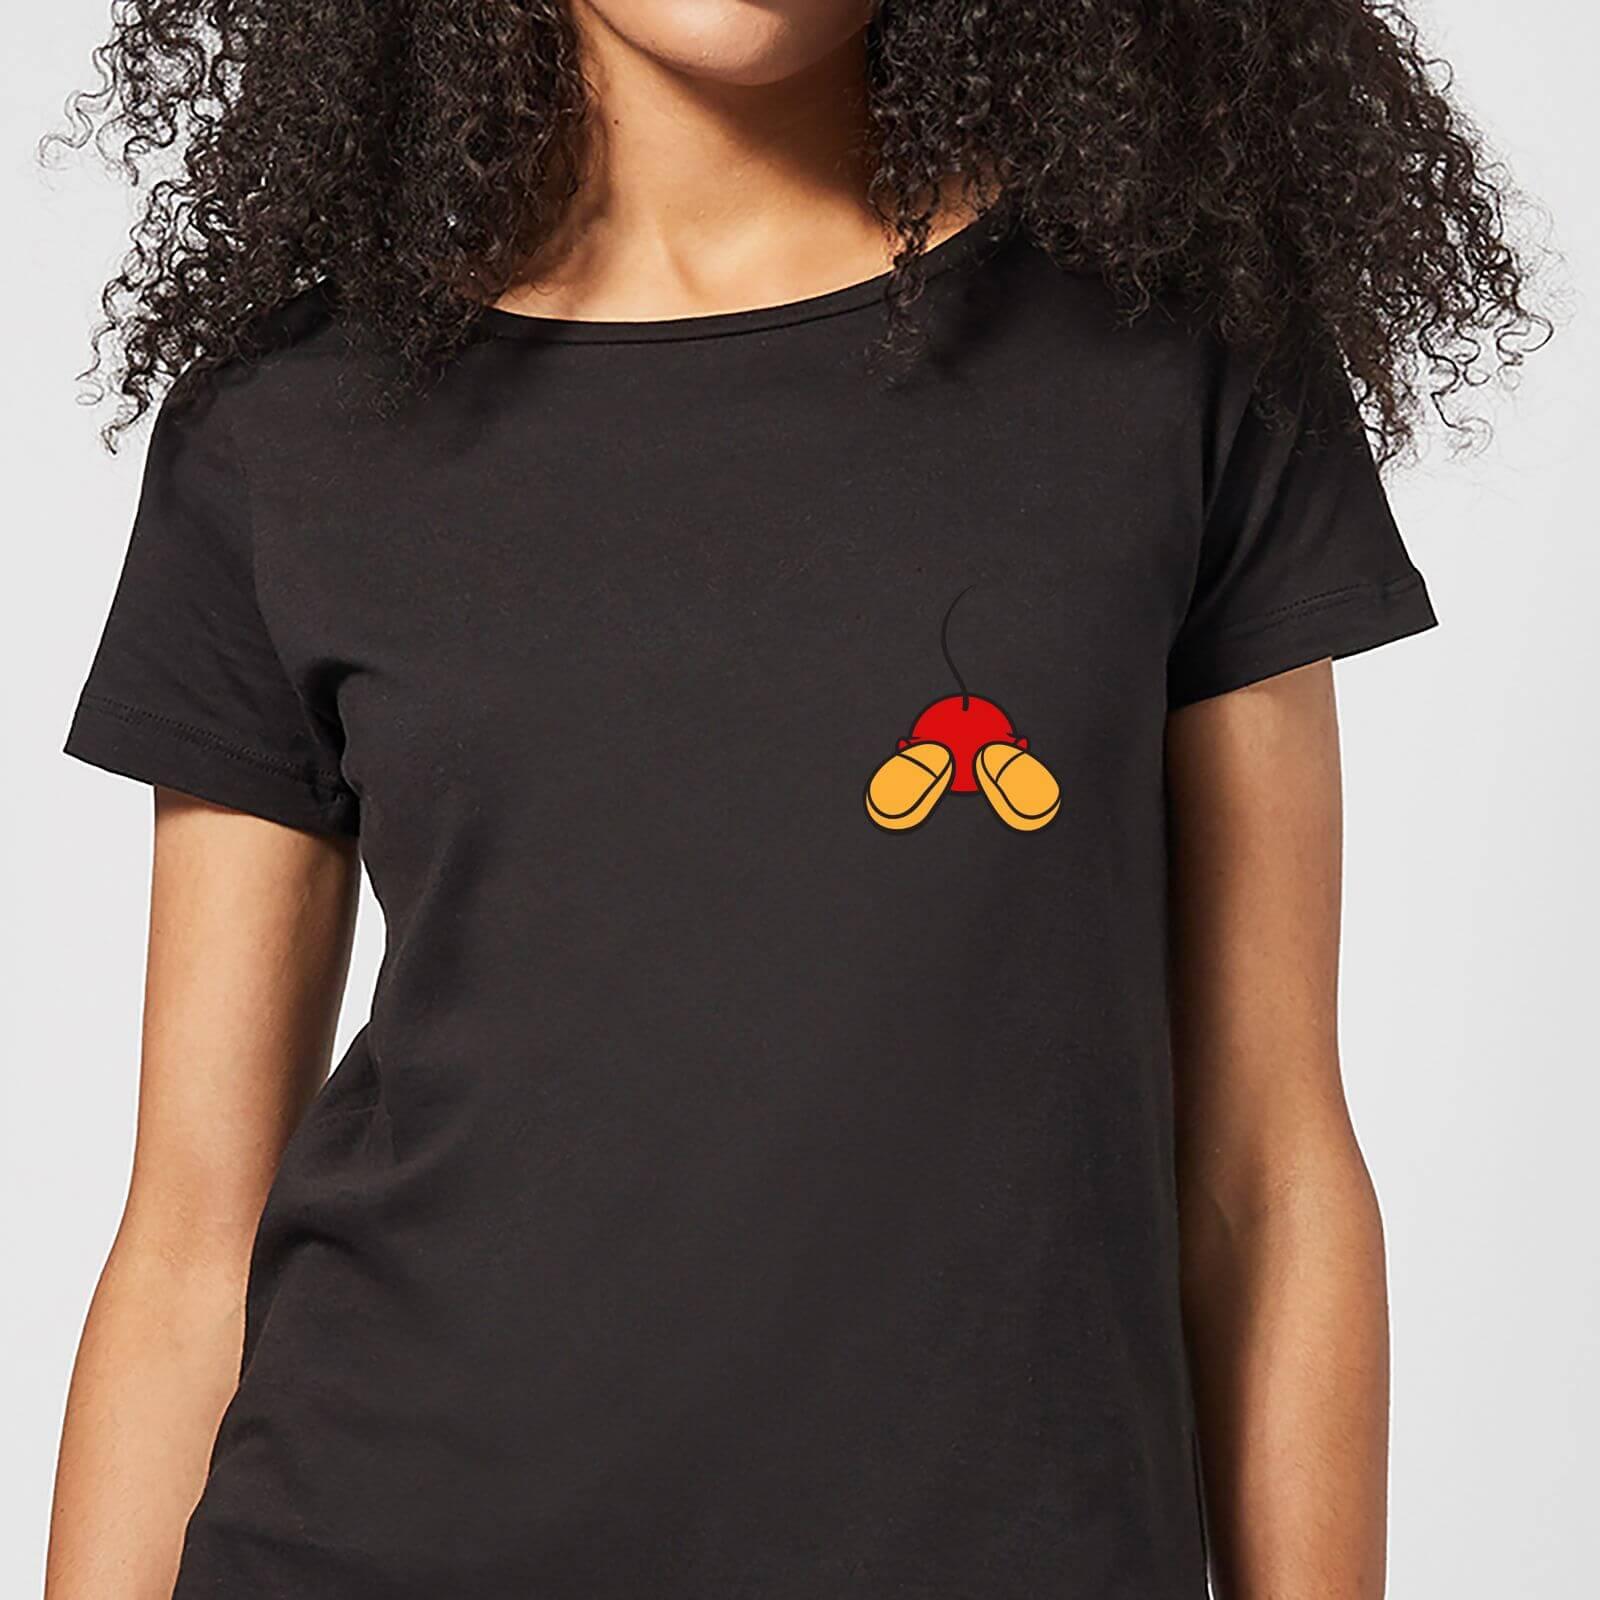 Disney Disney Mickey Mouse Backside Women's T-Shirt - Black - 3XL - Black